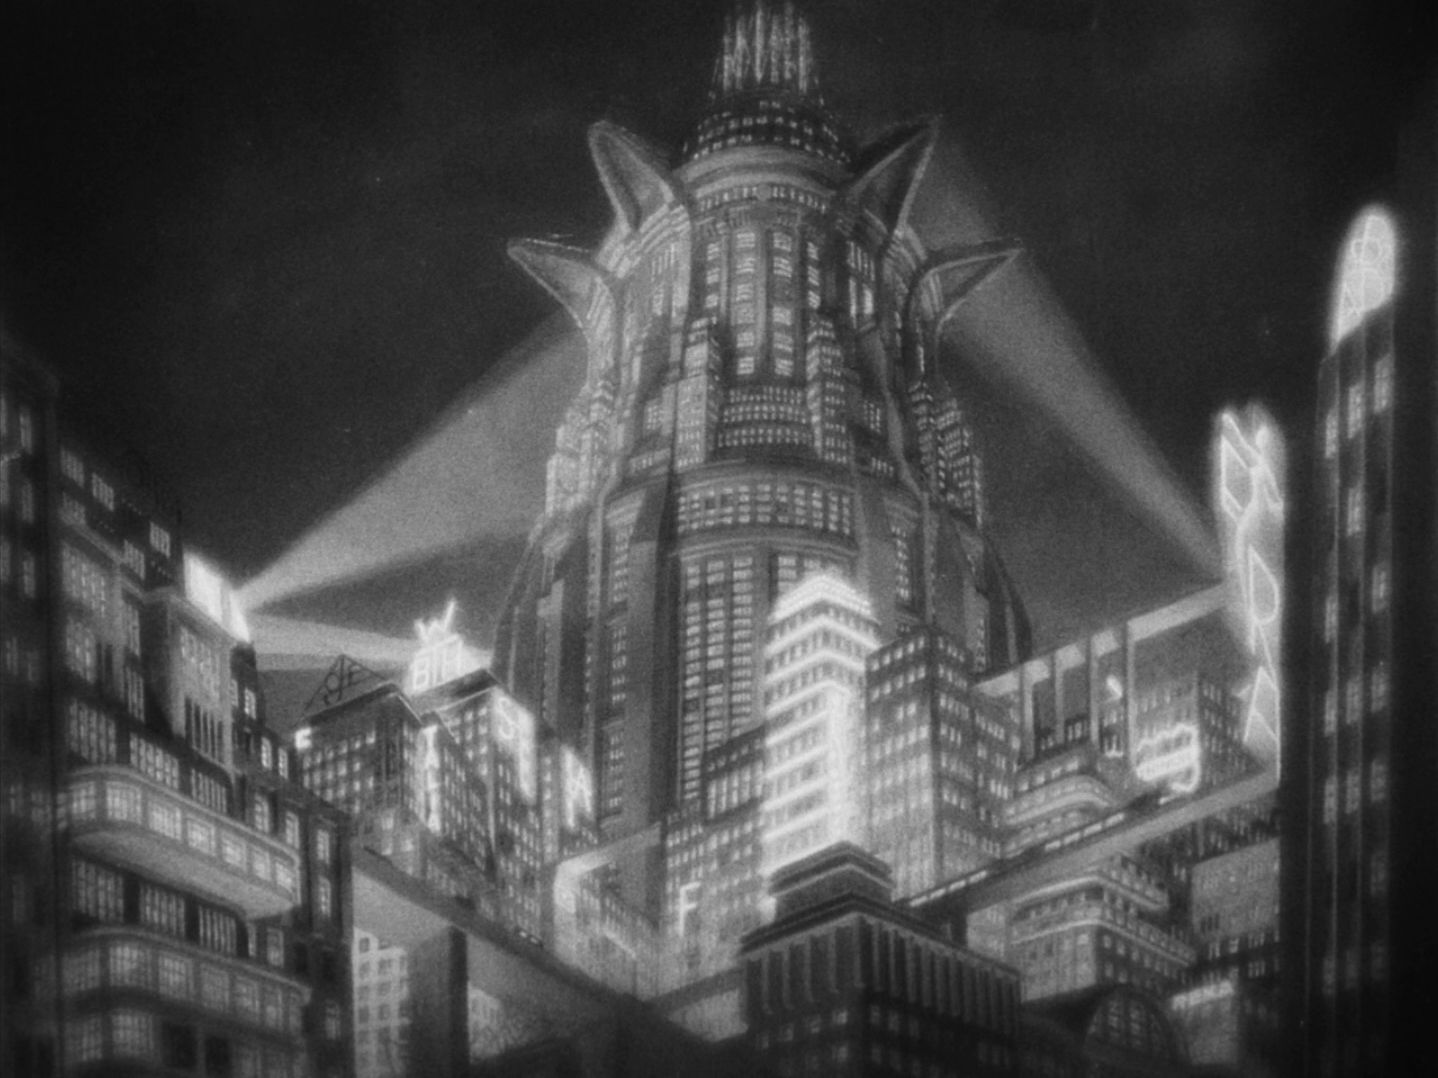 Immagine di http://www.dietrolequinteonline.it/wp-content/uploads/2013/03/Metropolis-1927-di-Fritz-Lang-4.jpg.